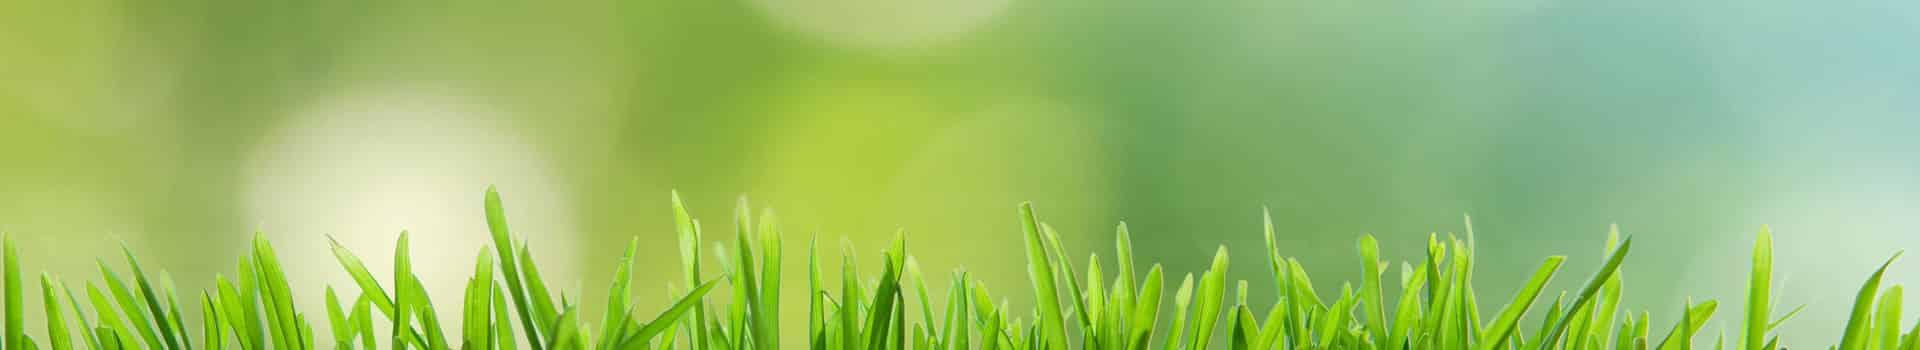 growshop-chile-online-santiago-maipu-cannabis-indoor-cultivo-marihuana-thc-cbd